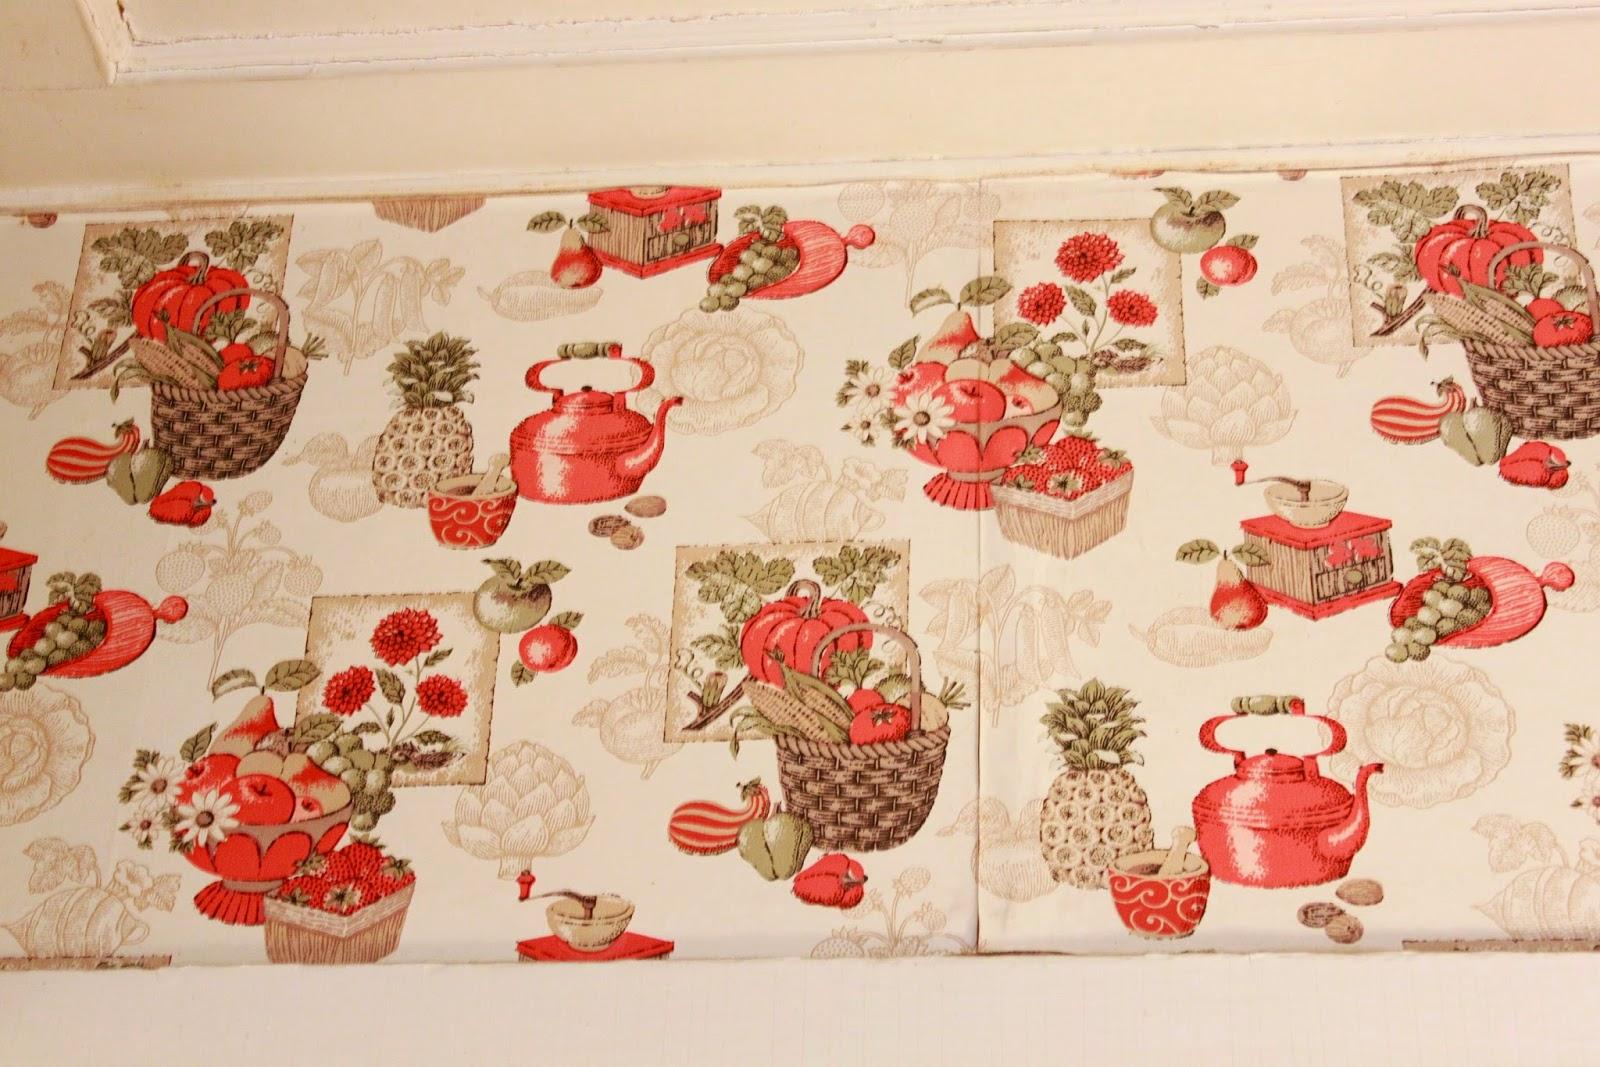 Vintage kitchen wallpaper patterns - Beneath The Tea Kettle Wallpaper